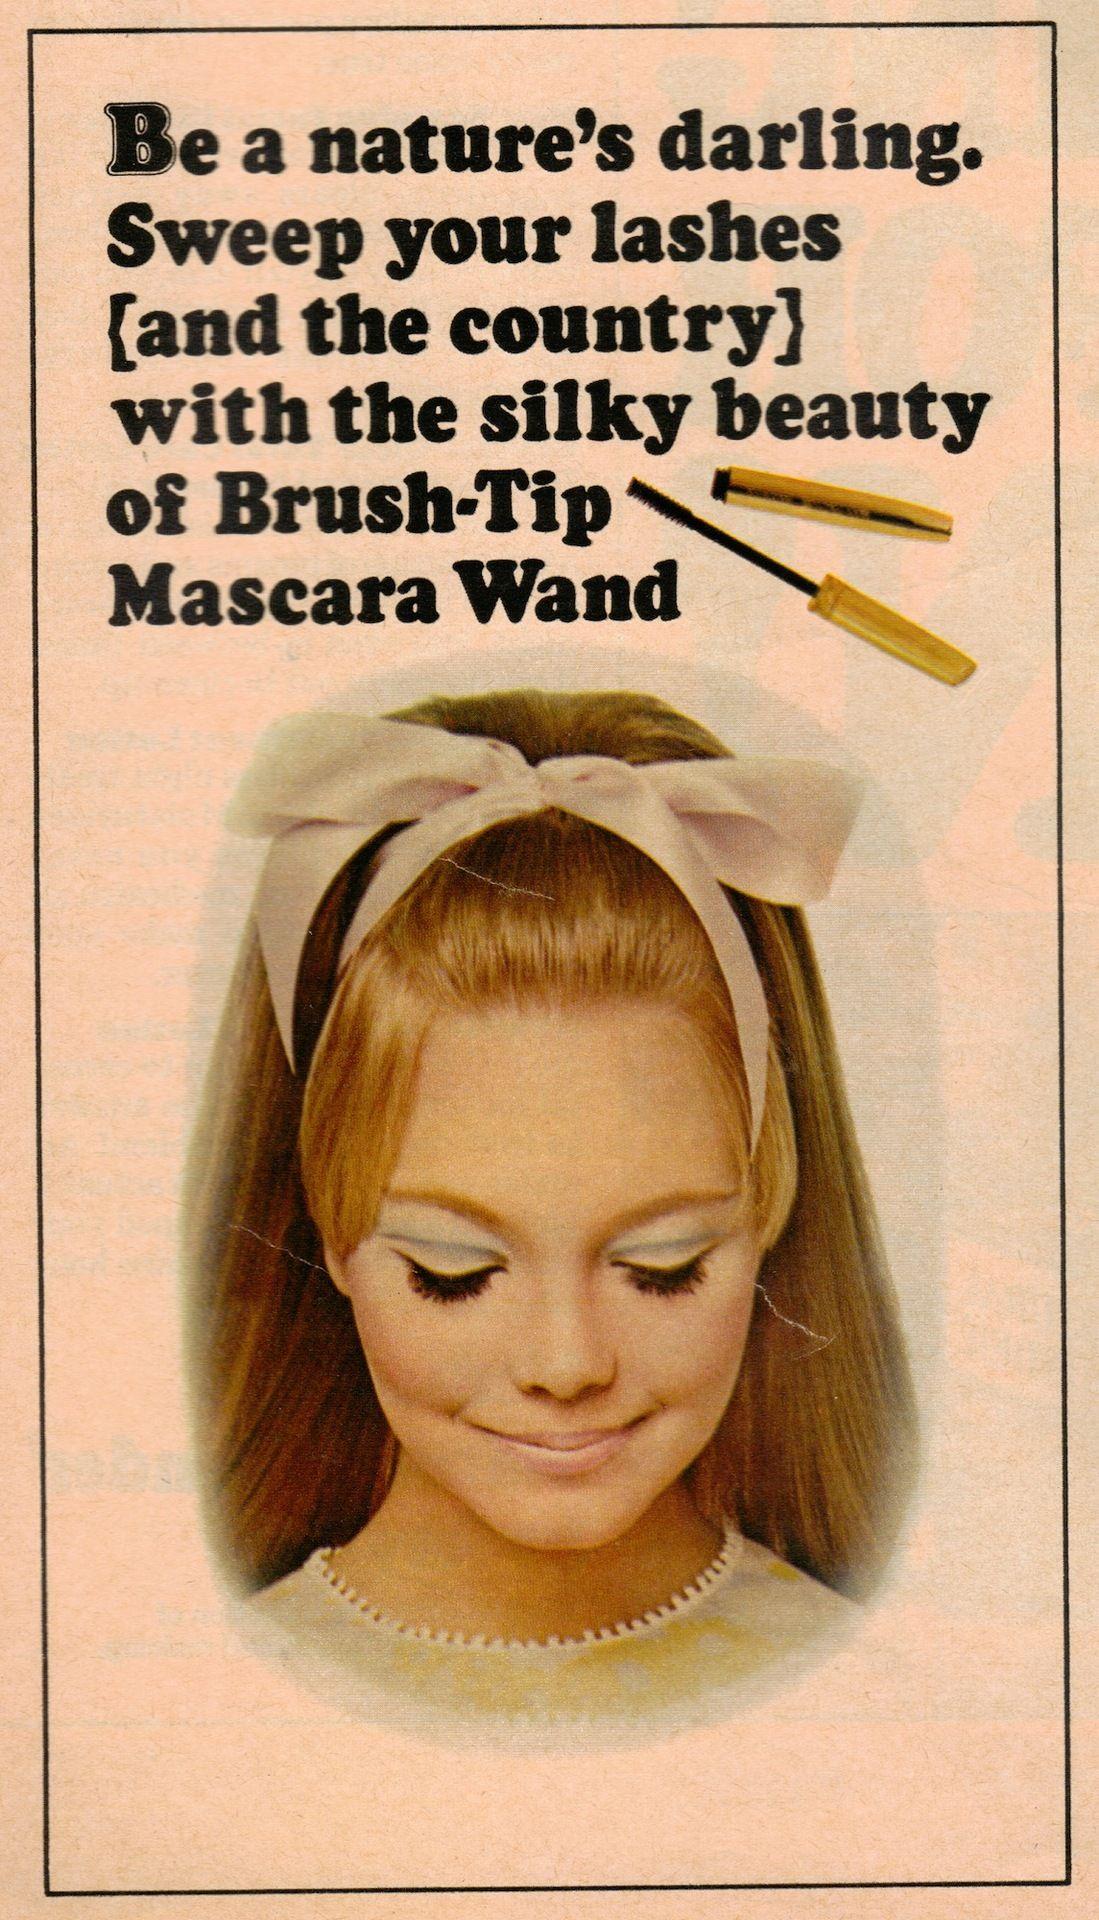 1960s mascara advertisement Sixties Looks Pinterest